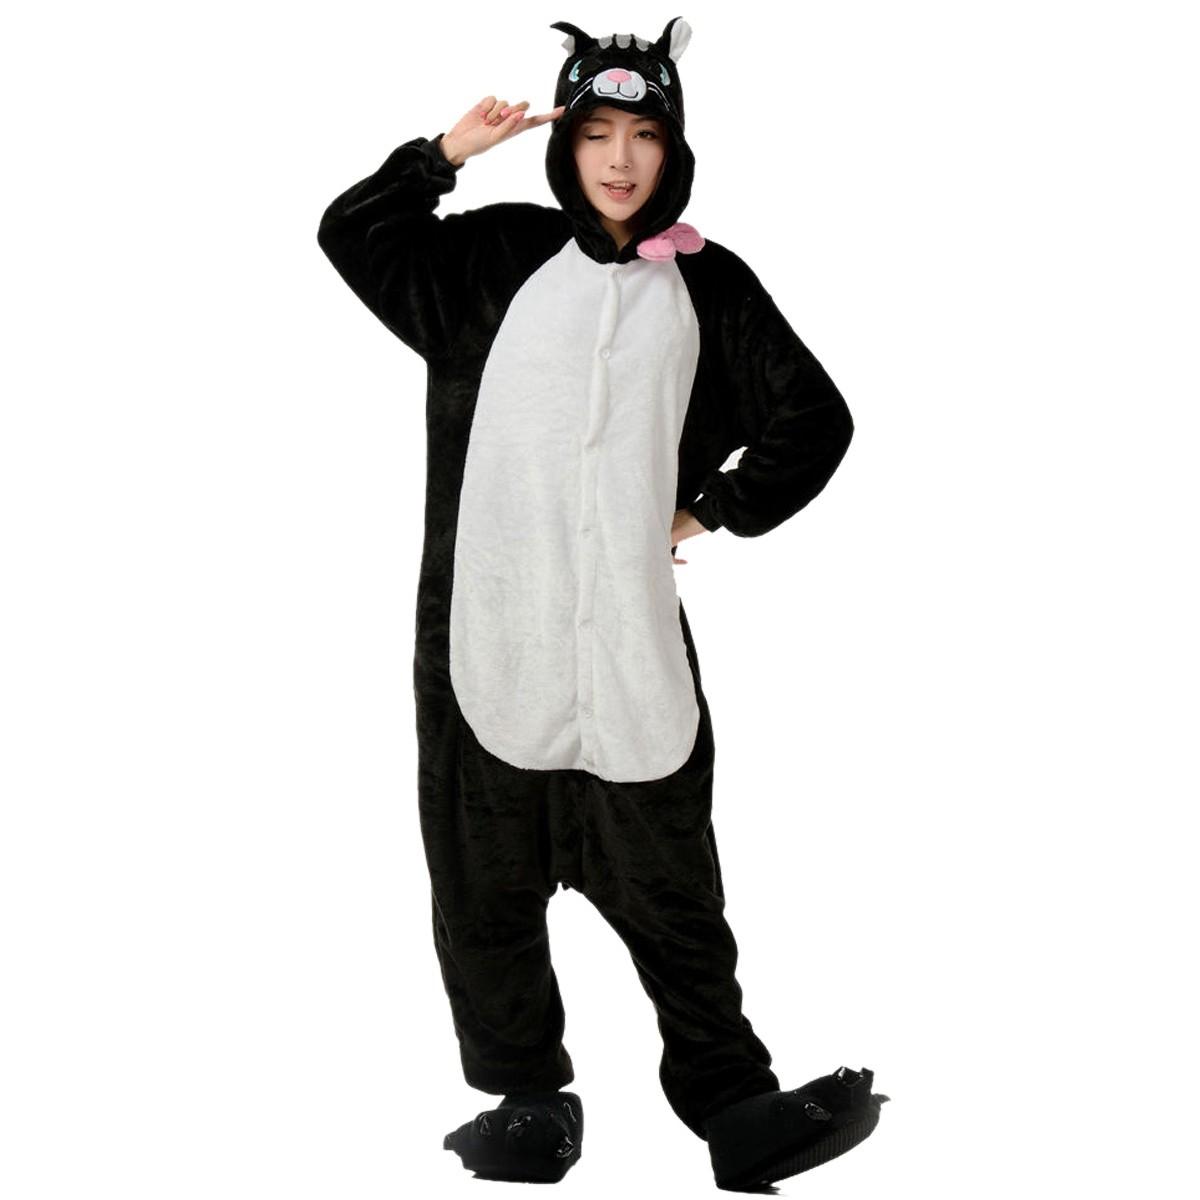 black cat onesie, black cat pajamas for adult buy now